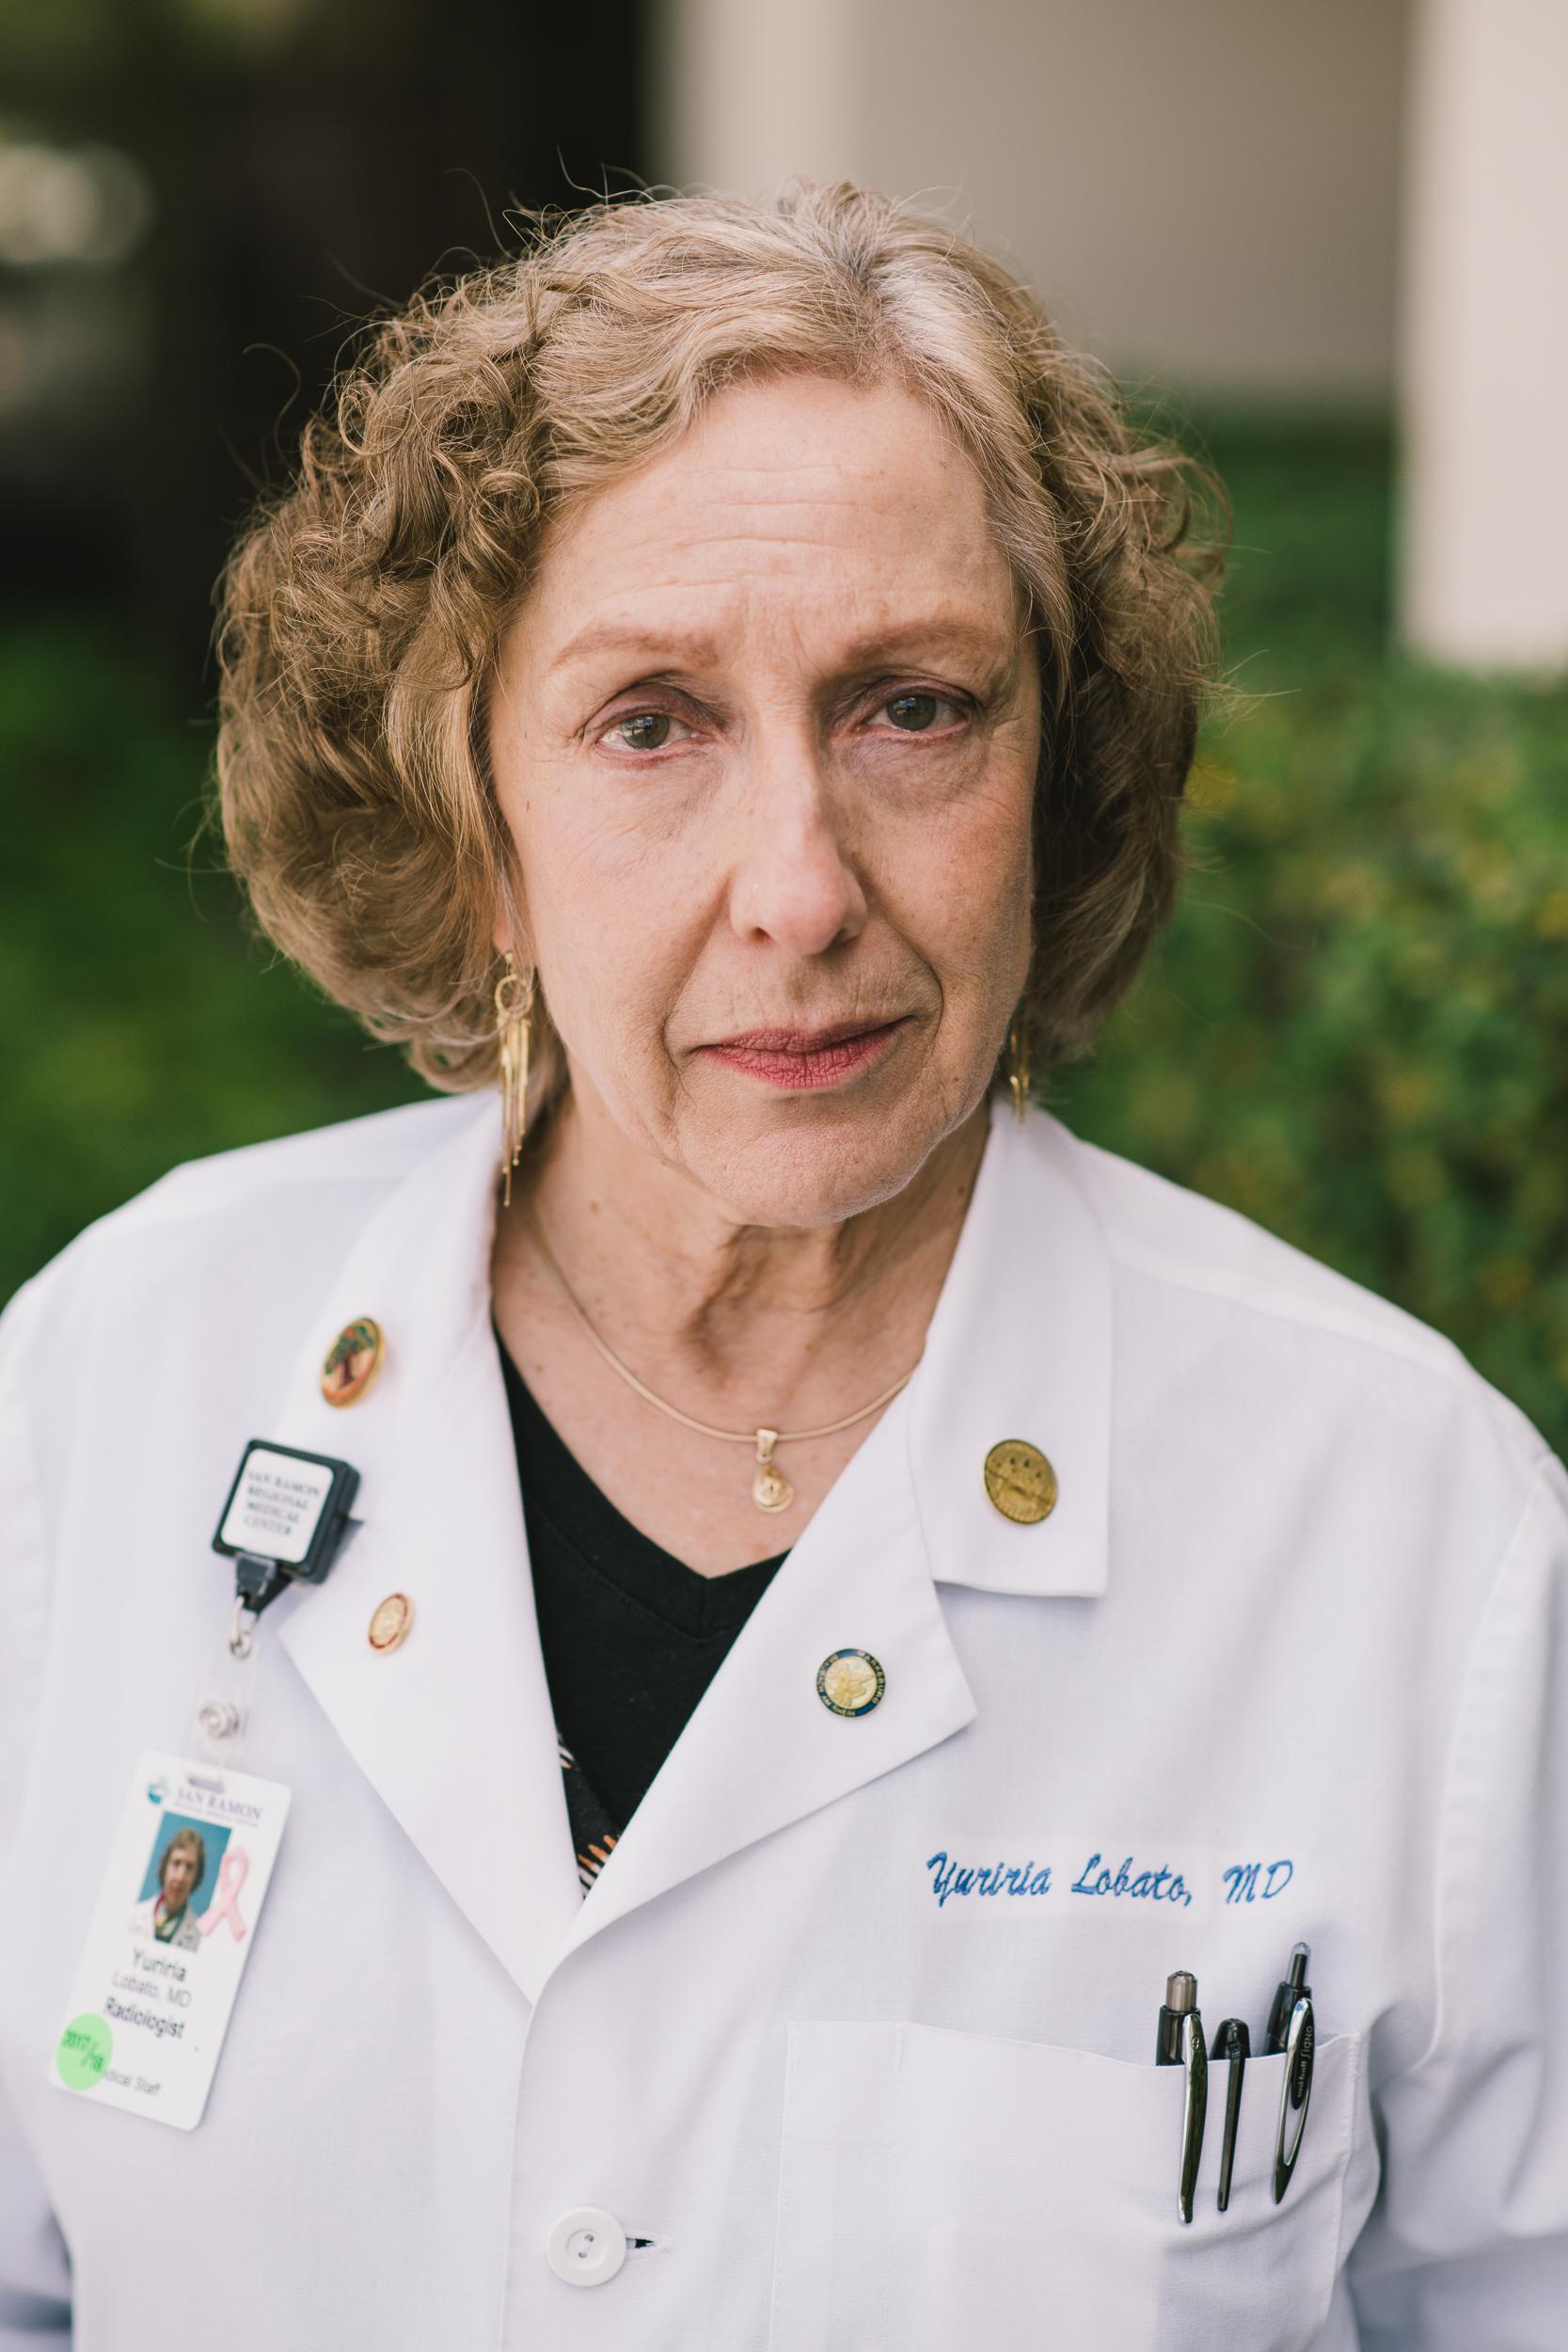 Yuririra Lobato, MD , diagnoistic radiology